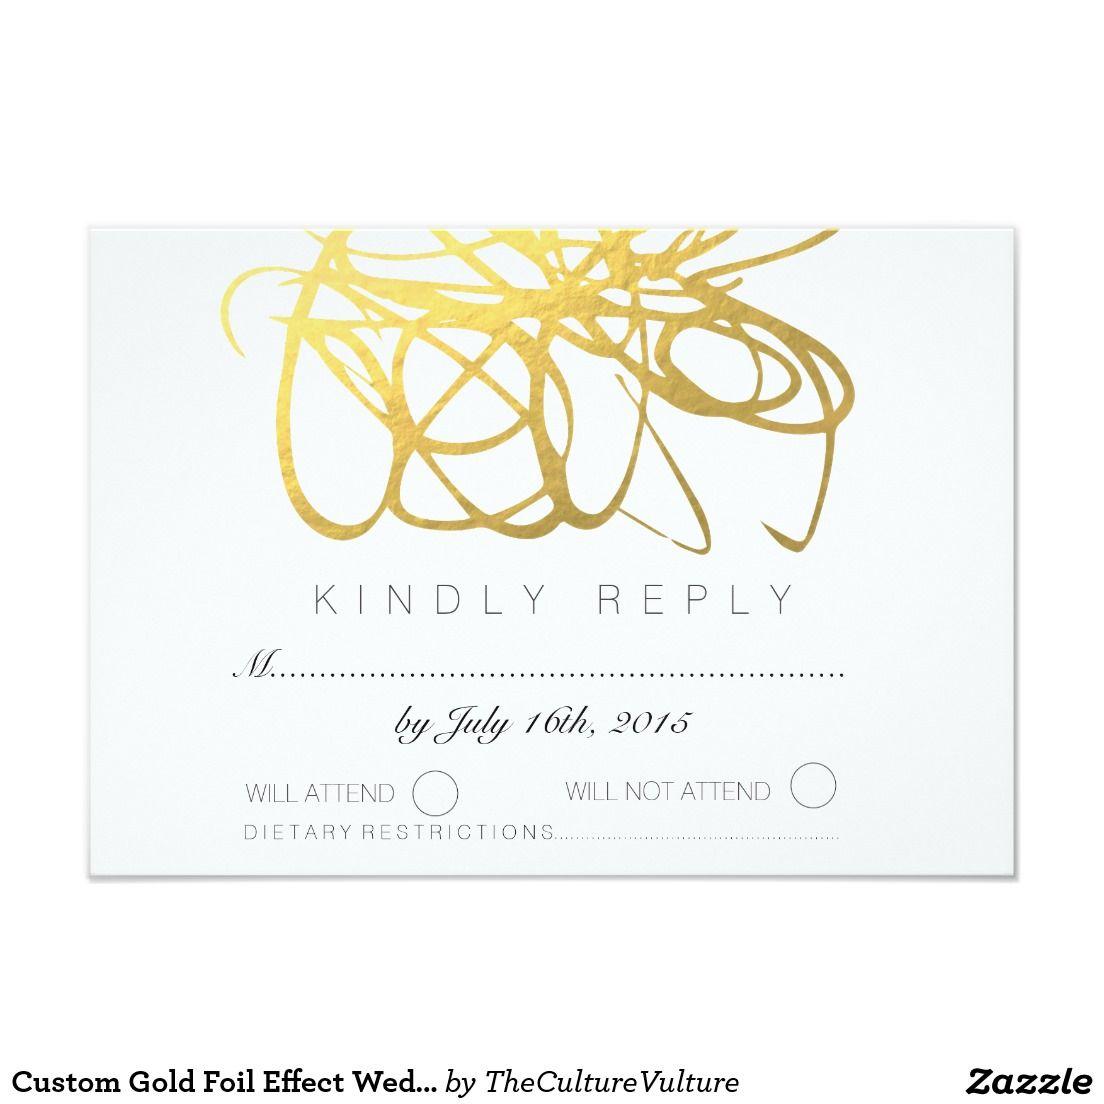 Custom Gold Foil Effect Wedding RSVP Reply Card | Gold Wedding ...